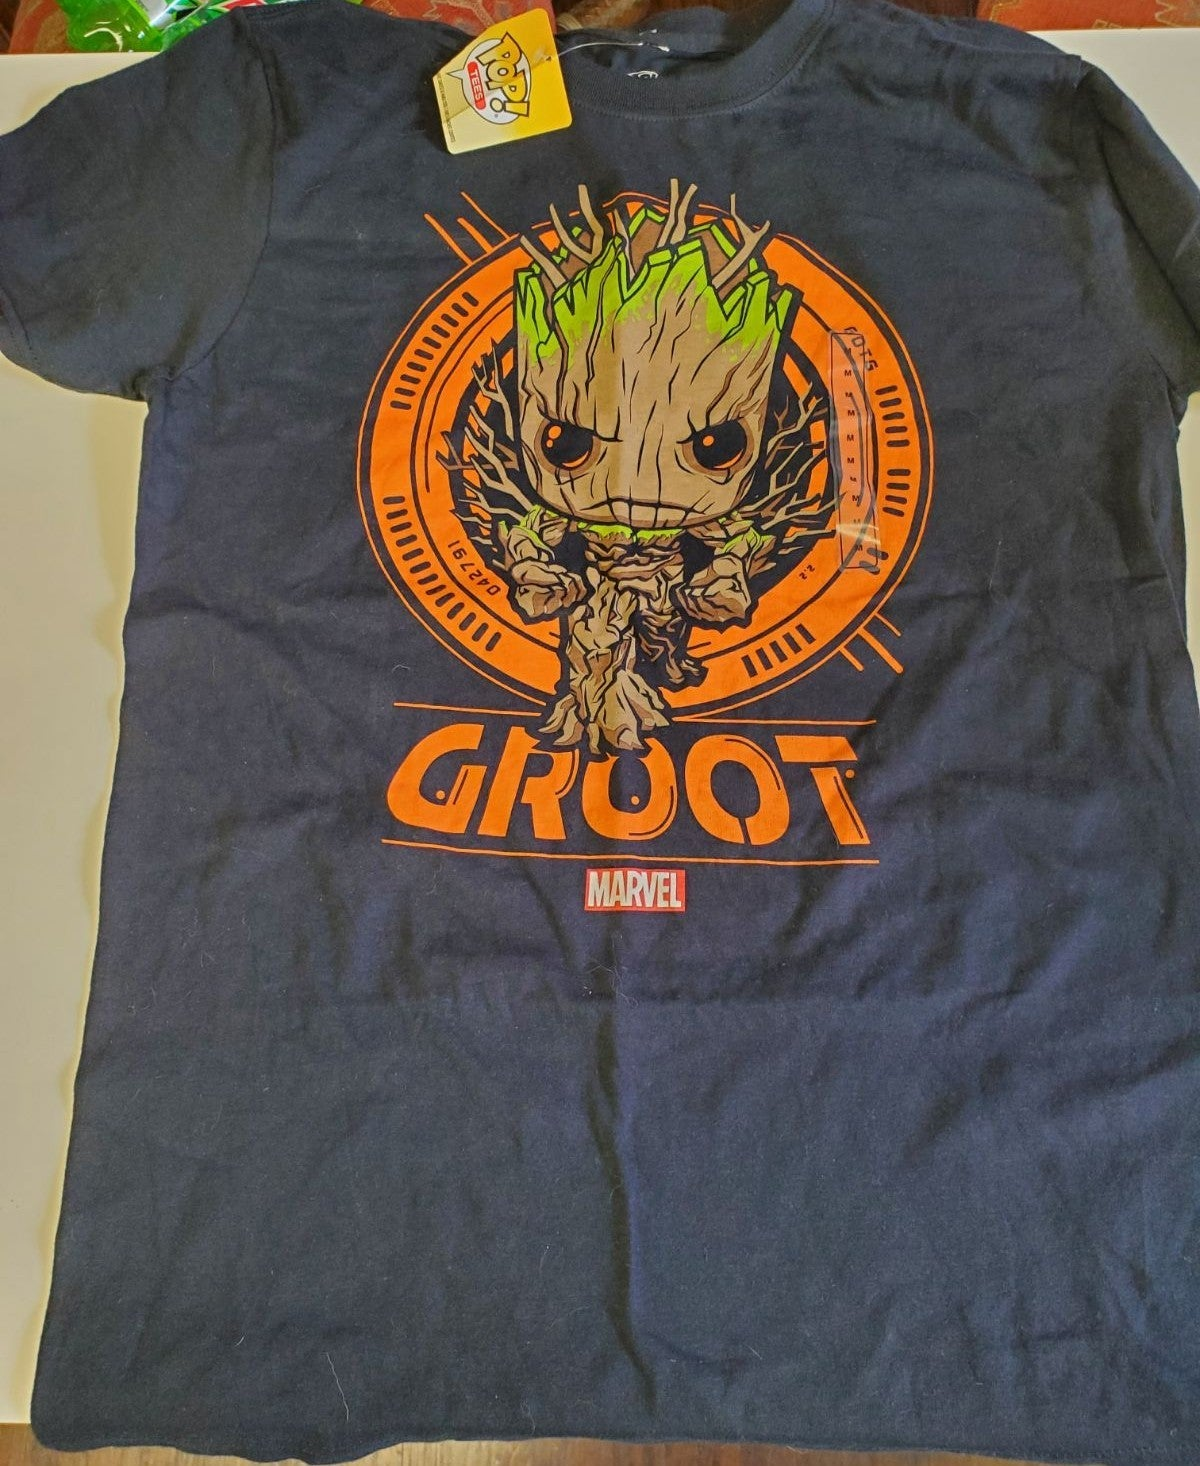 Marvel Groot Adult size medium shirt